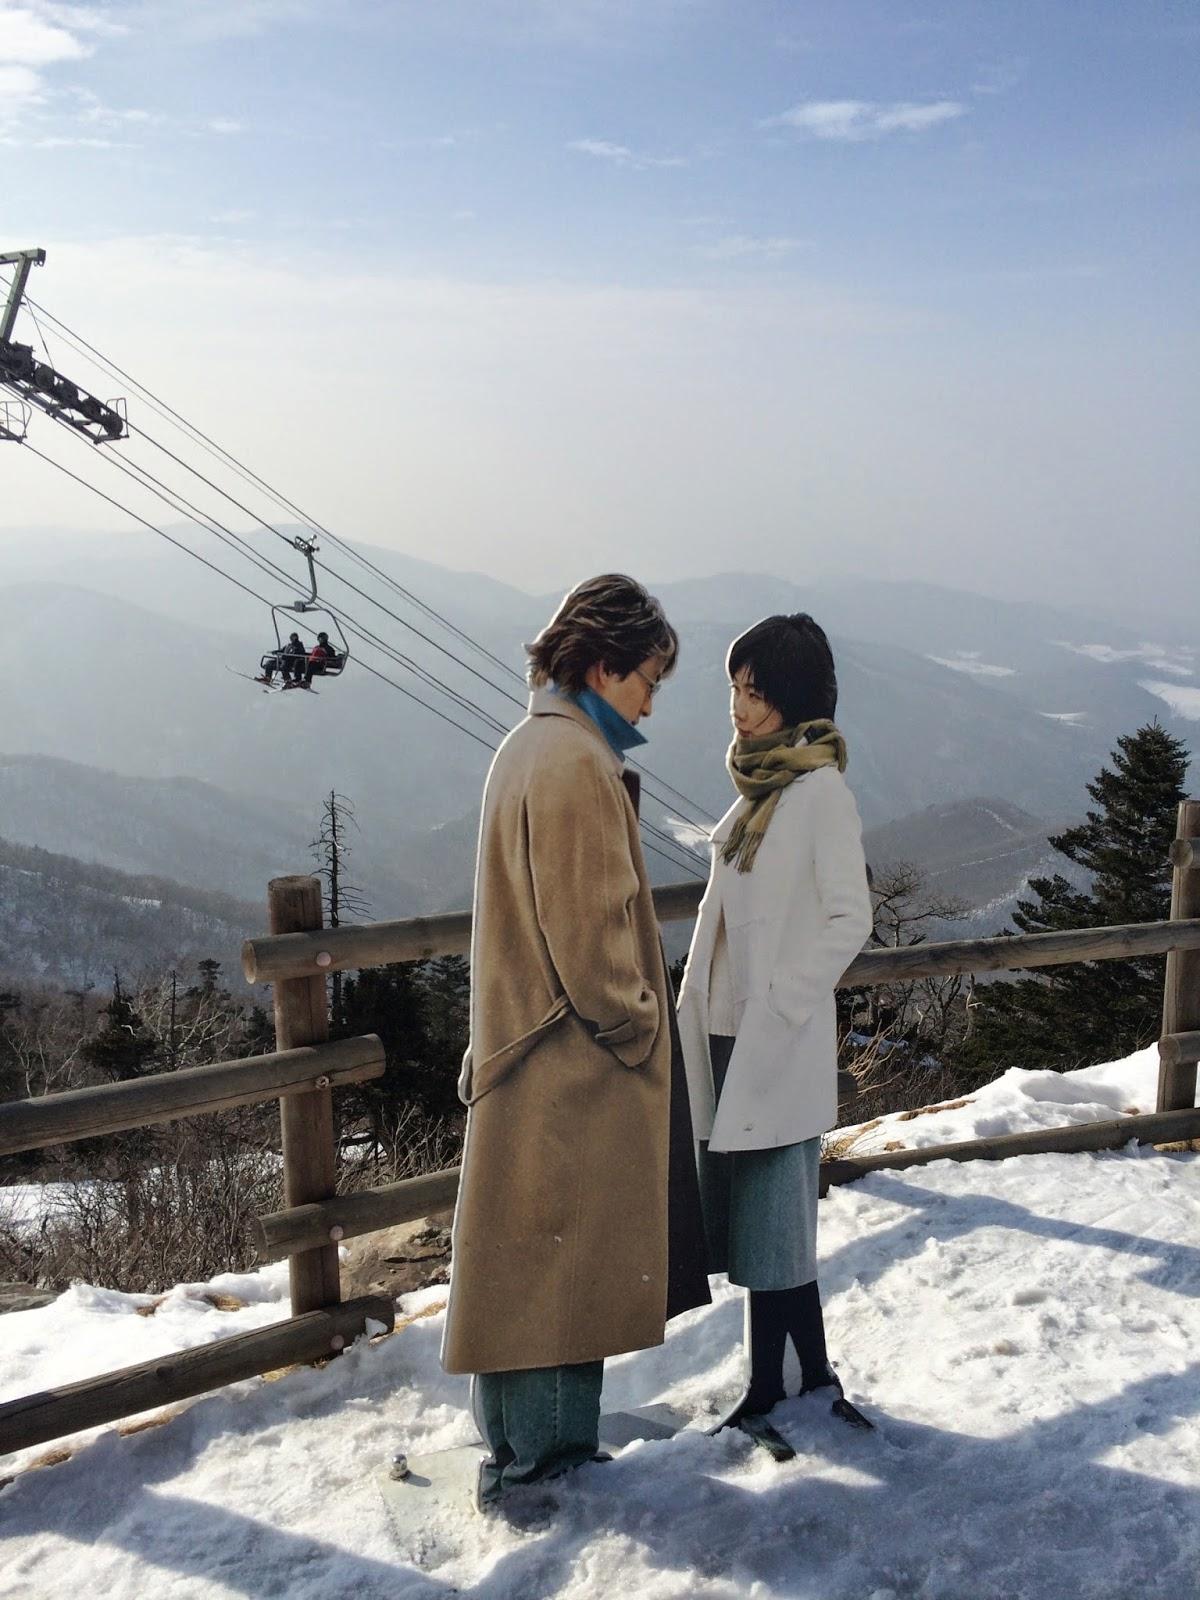 winter sonata part iii: ski yongpyong   a journey of a thousand steps